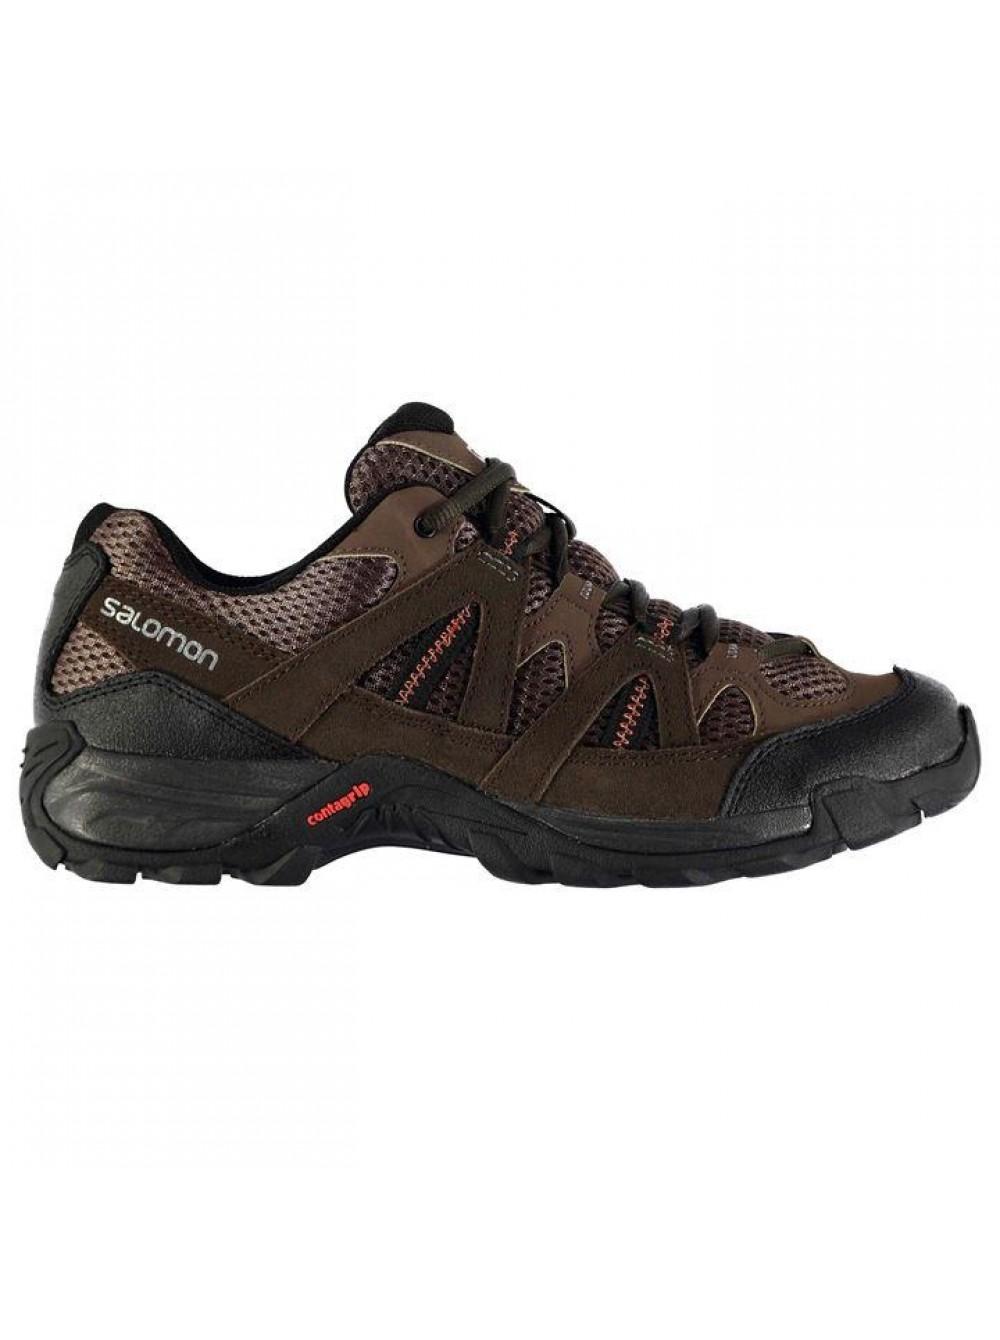 Salomon Aztek Vent - Трекінгові кросівки 2a1c71ccc6621